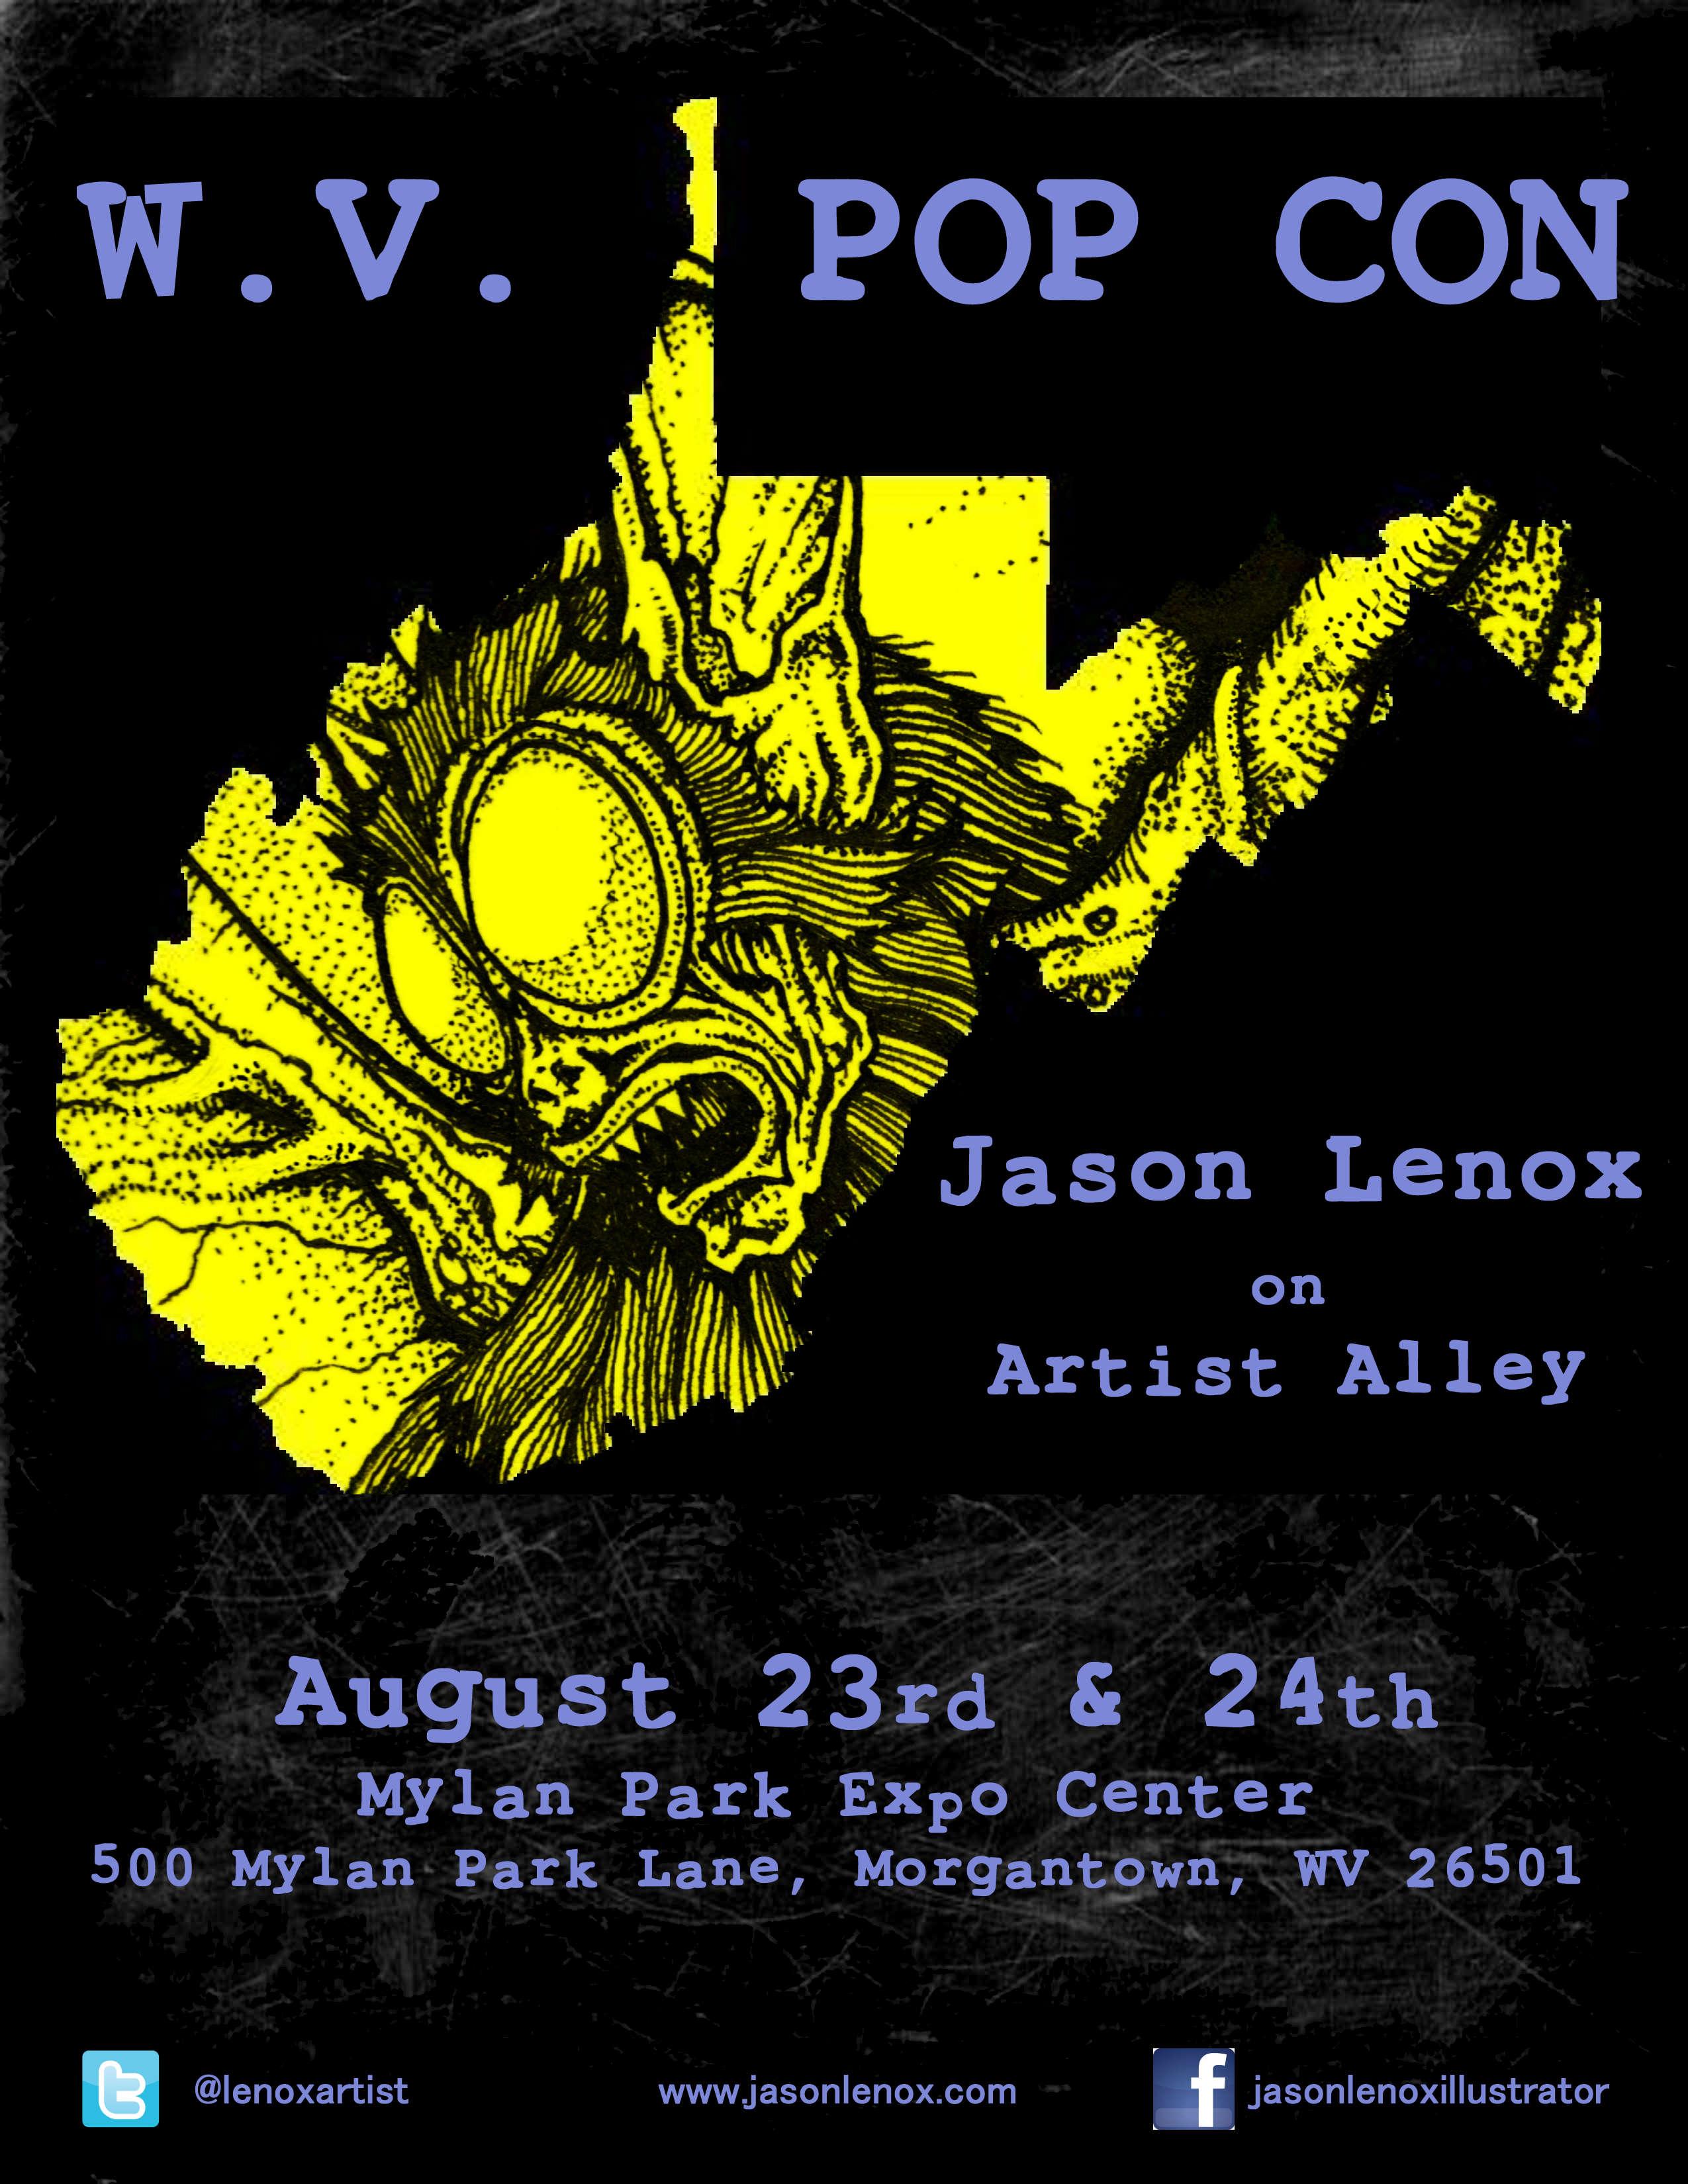 Poster design using gimp - Jason Lenox Wvpop Con Poster Small